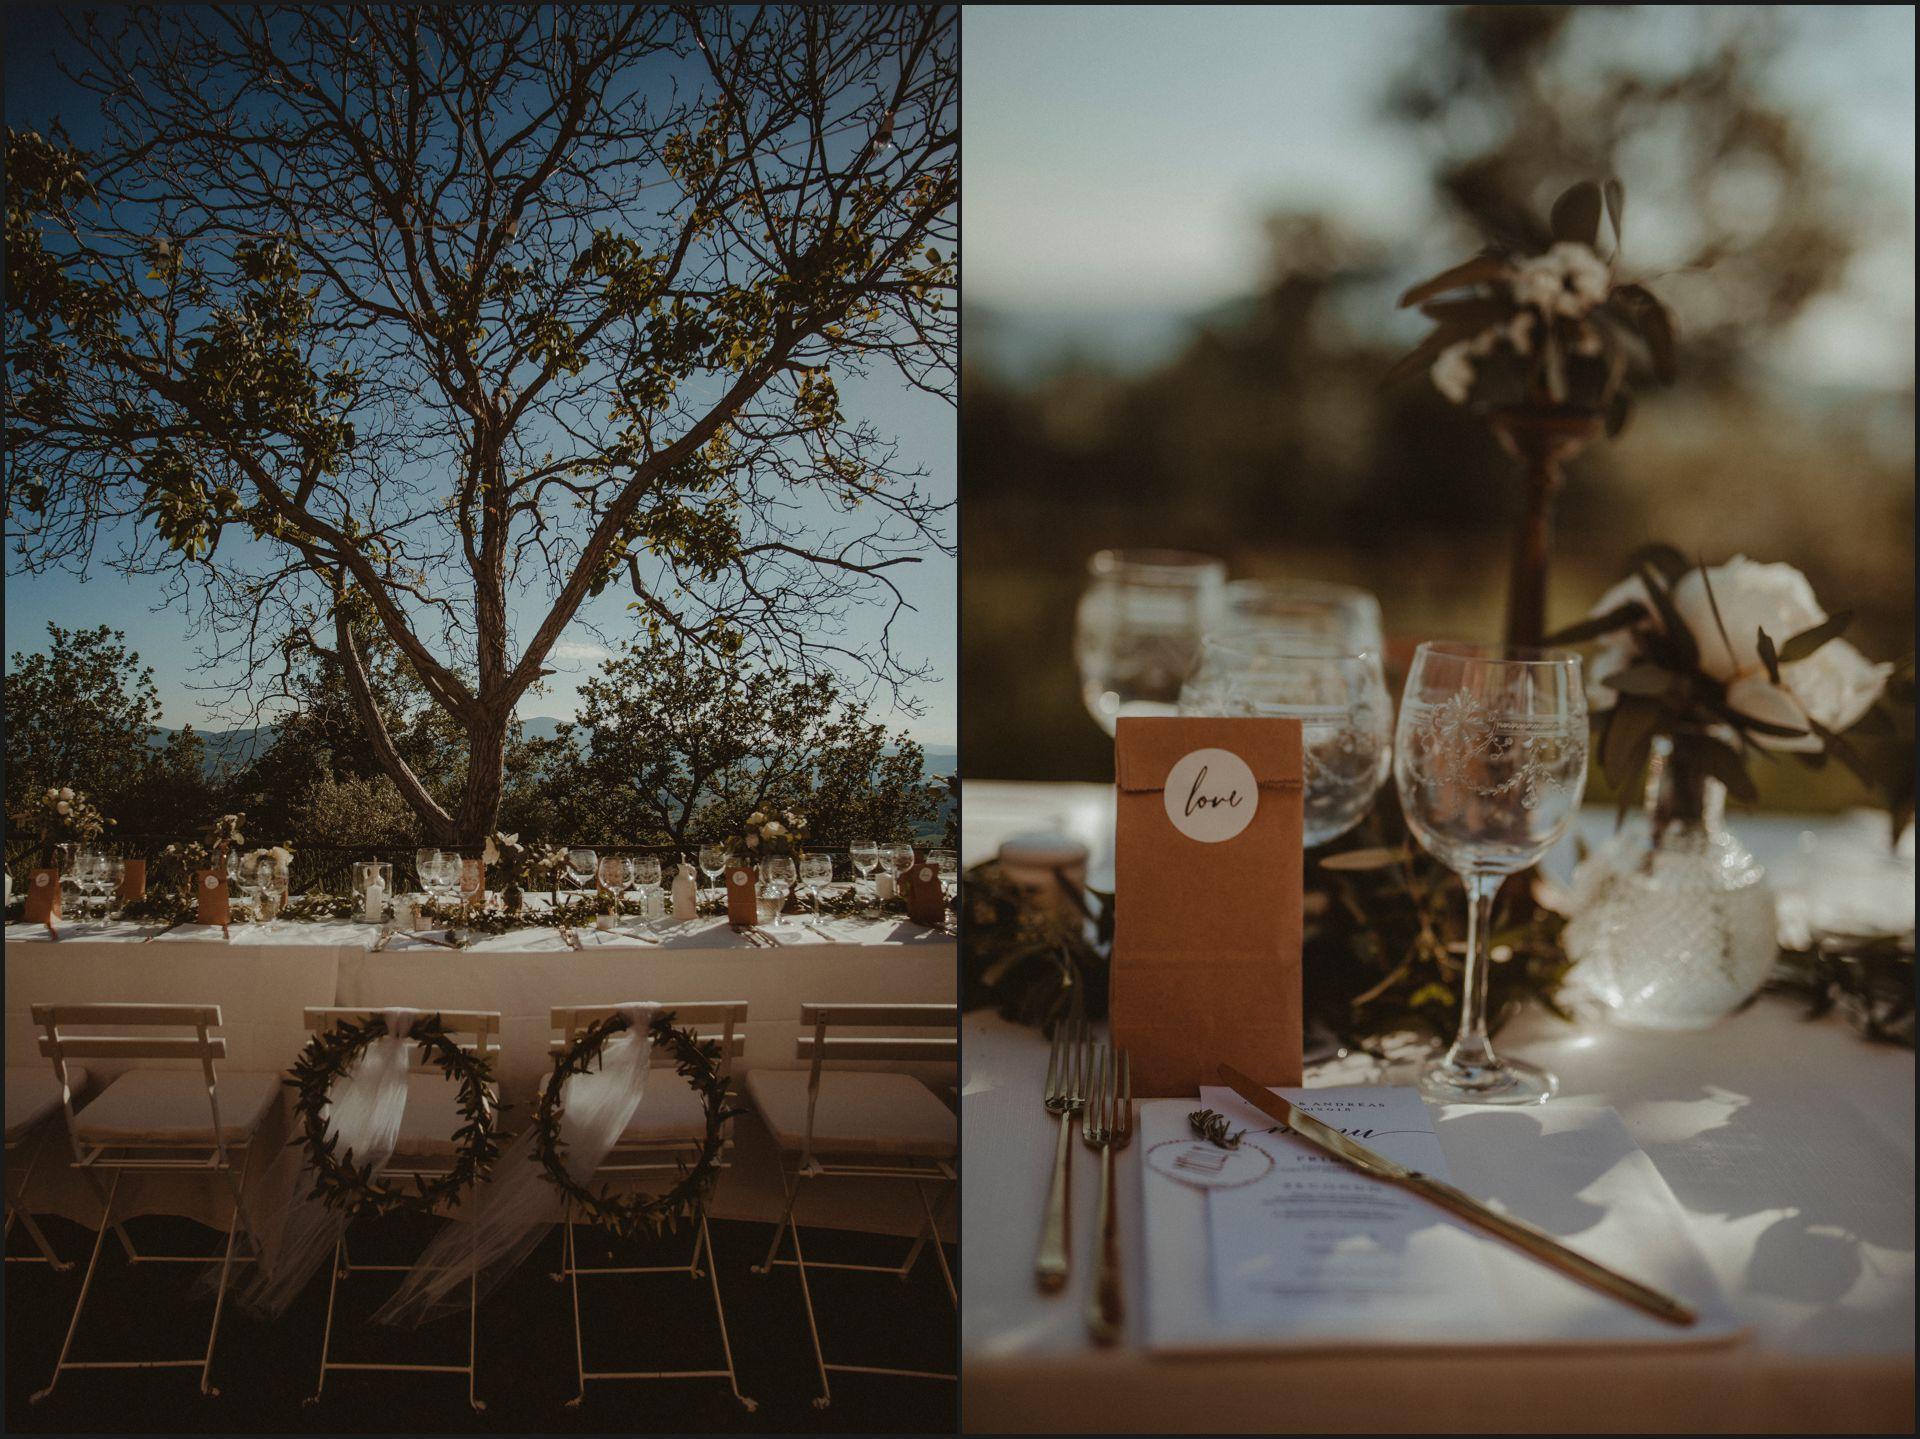 wedding, details, table set, menu, umbria, nikis resort